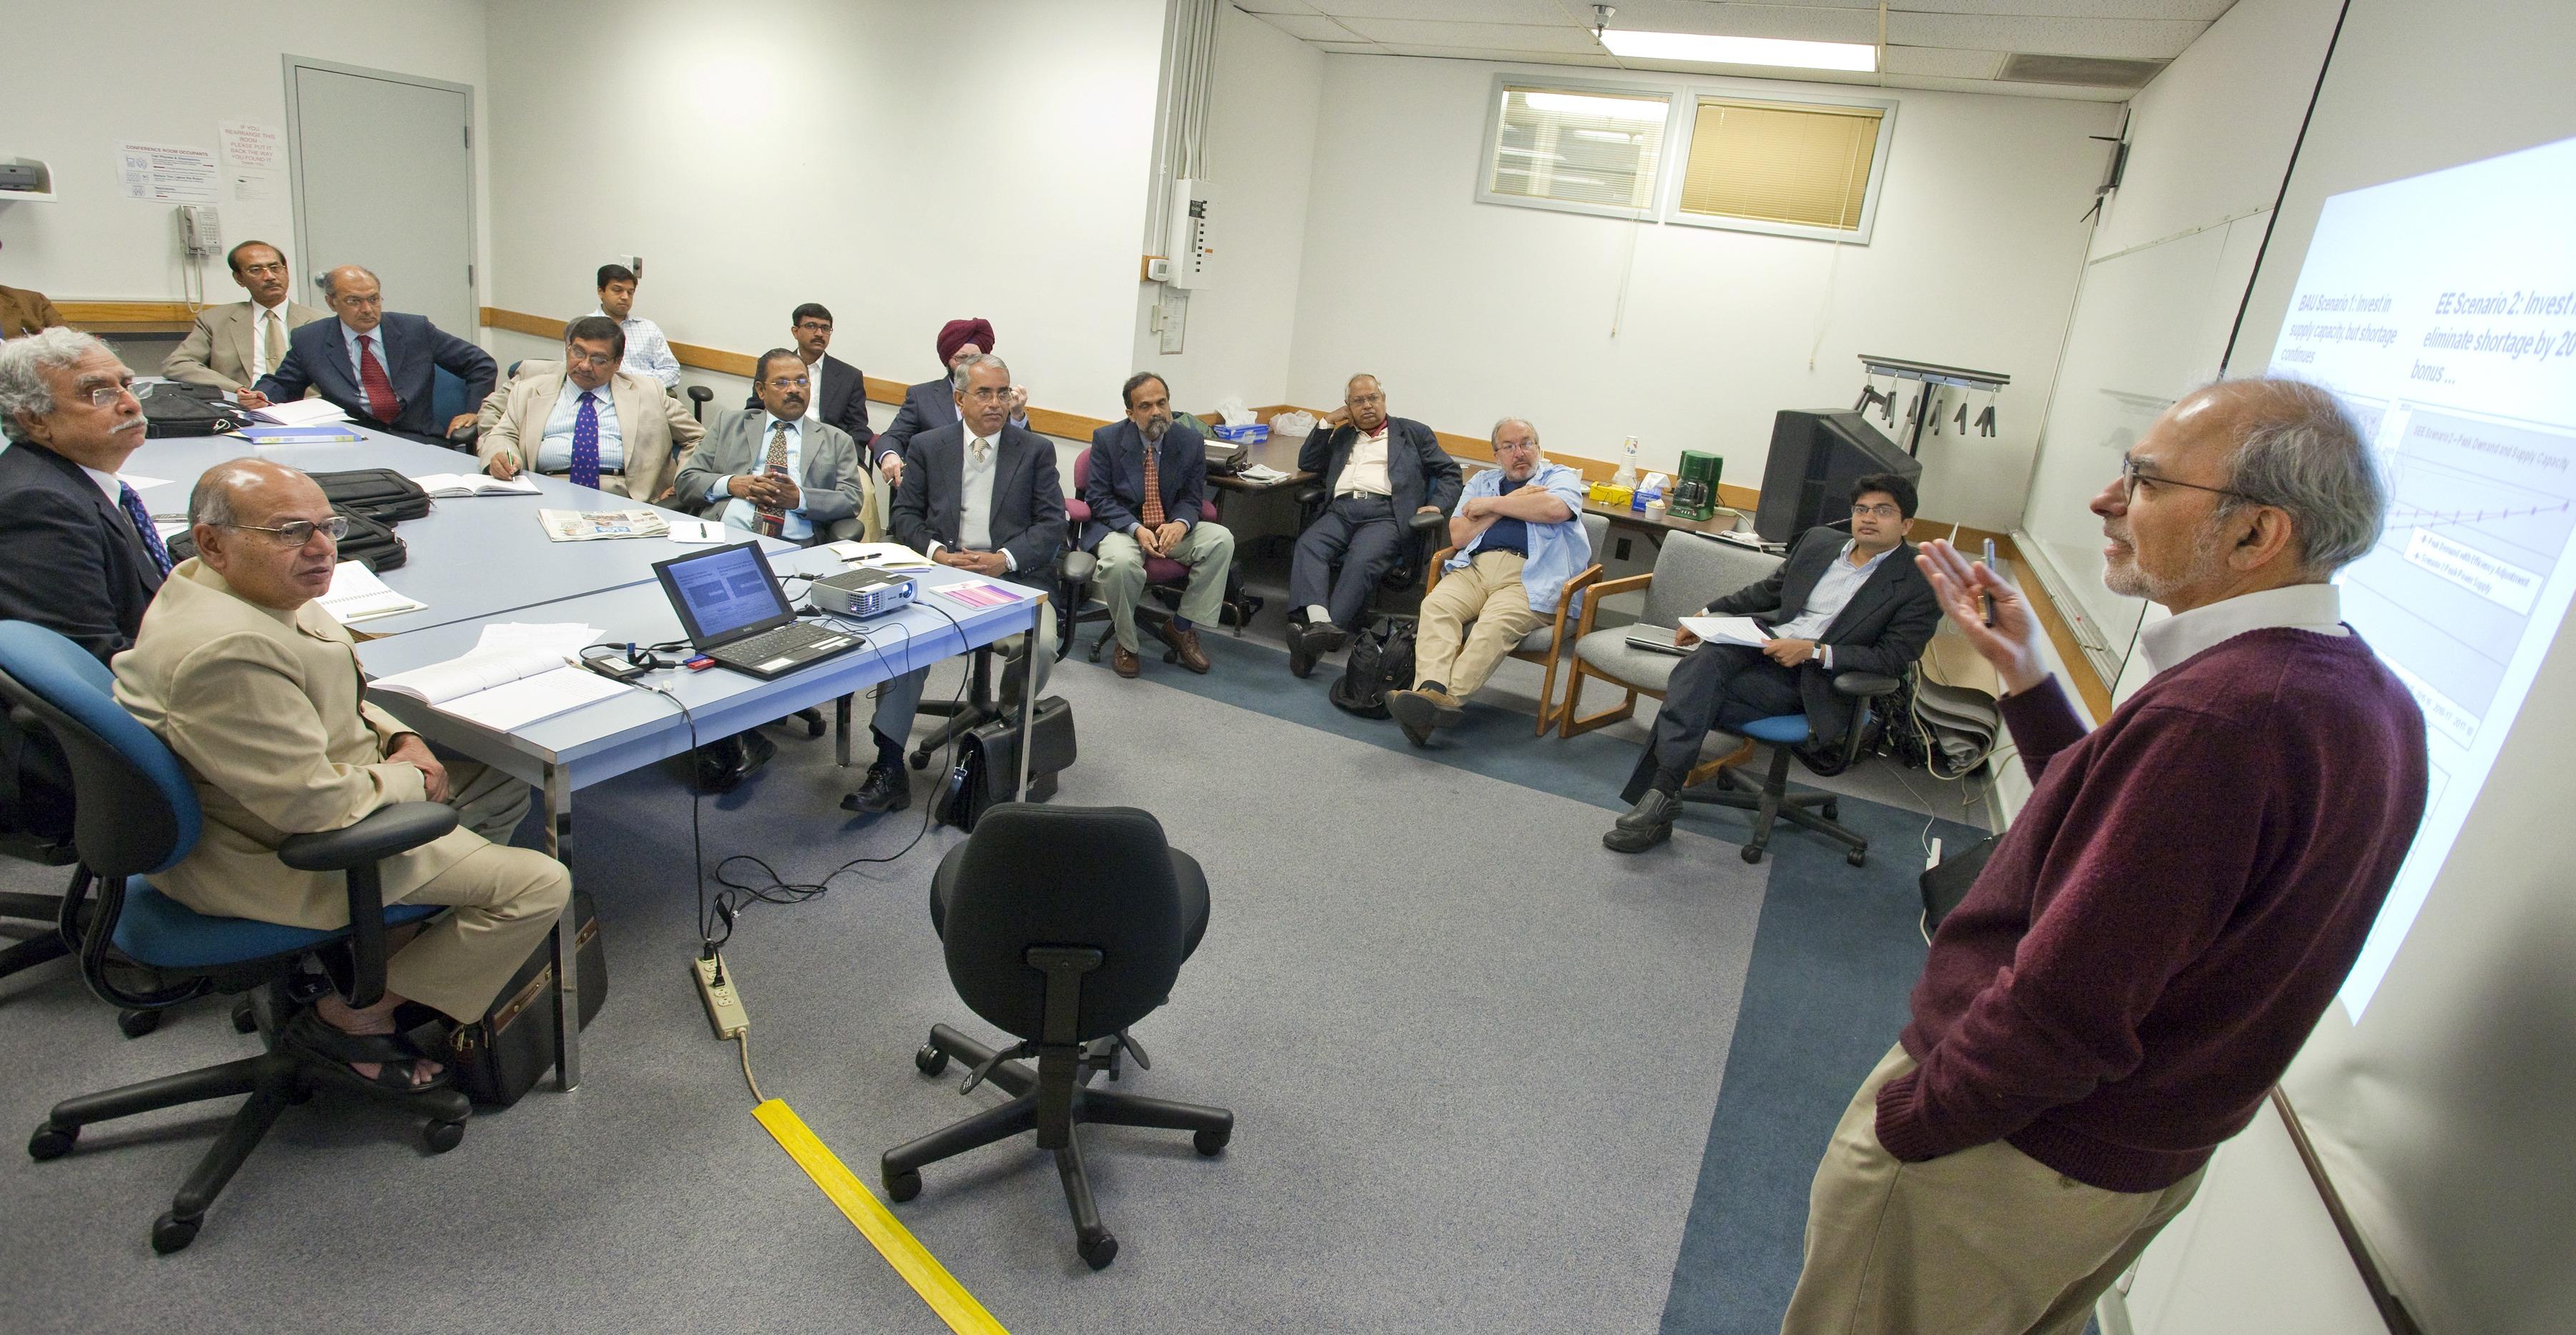 Berkeley Lab scientists Jayant Sathaye and Amol Phadke address a group